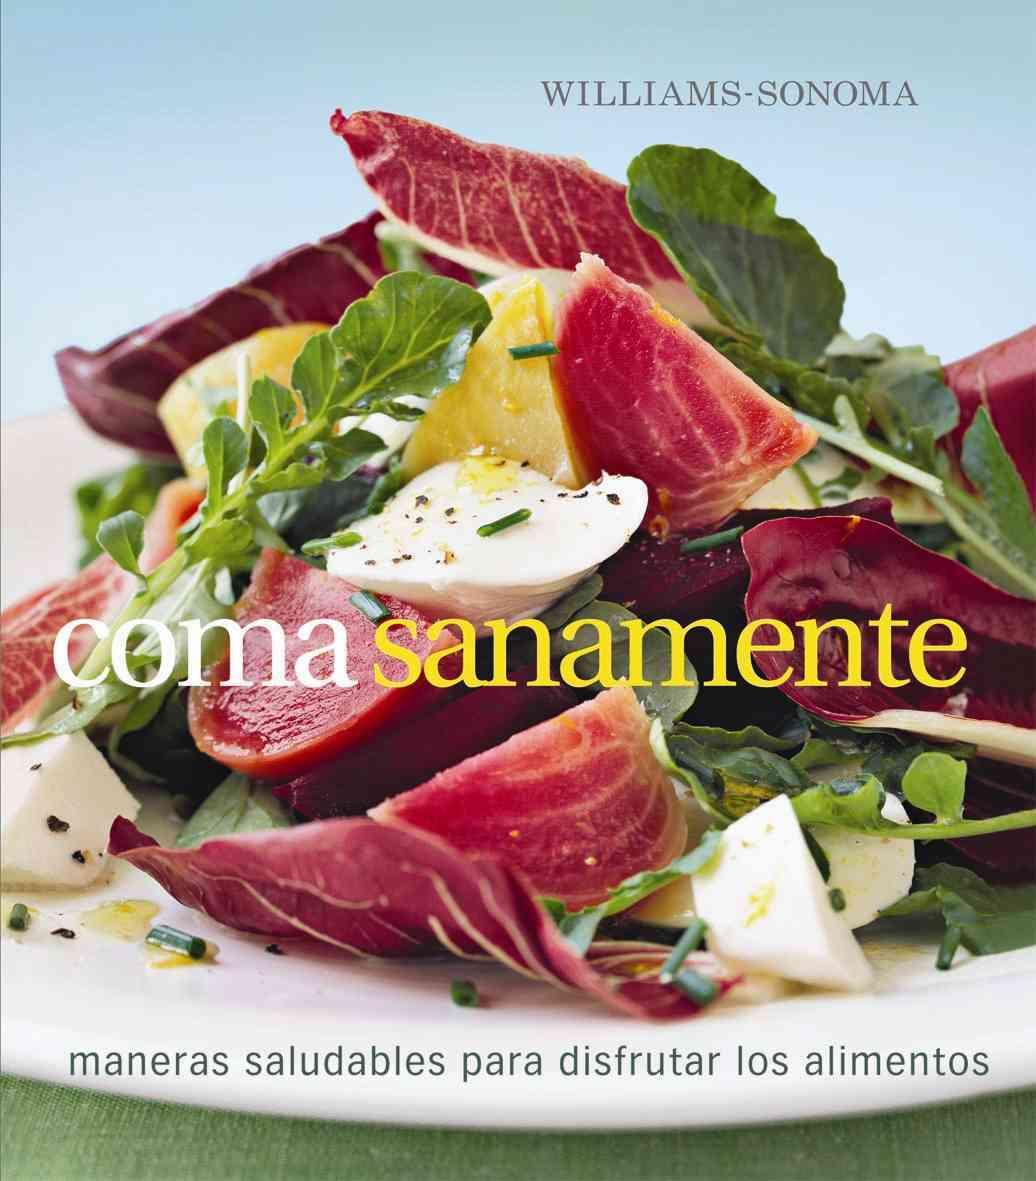 Coma Sanamente/ Eat Well By Ferreira, Charity/ Williams, Chuck (EDT)/ Okada, Kana (PHT)/ Cordera, Laura (TRN)/ De Jourdain, Concepcion O. (TRN)